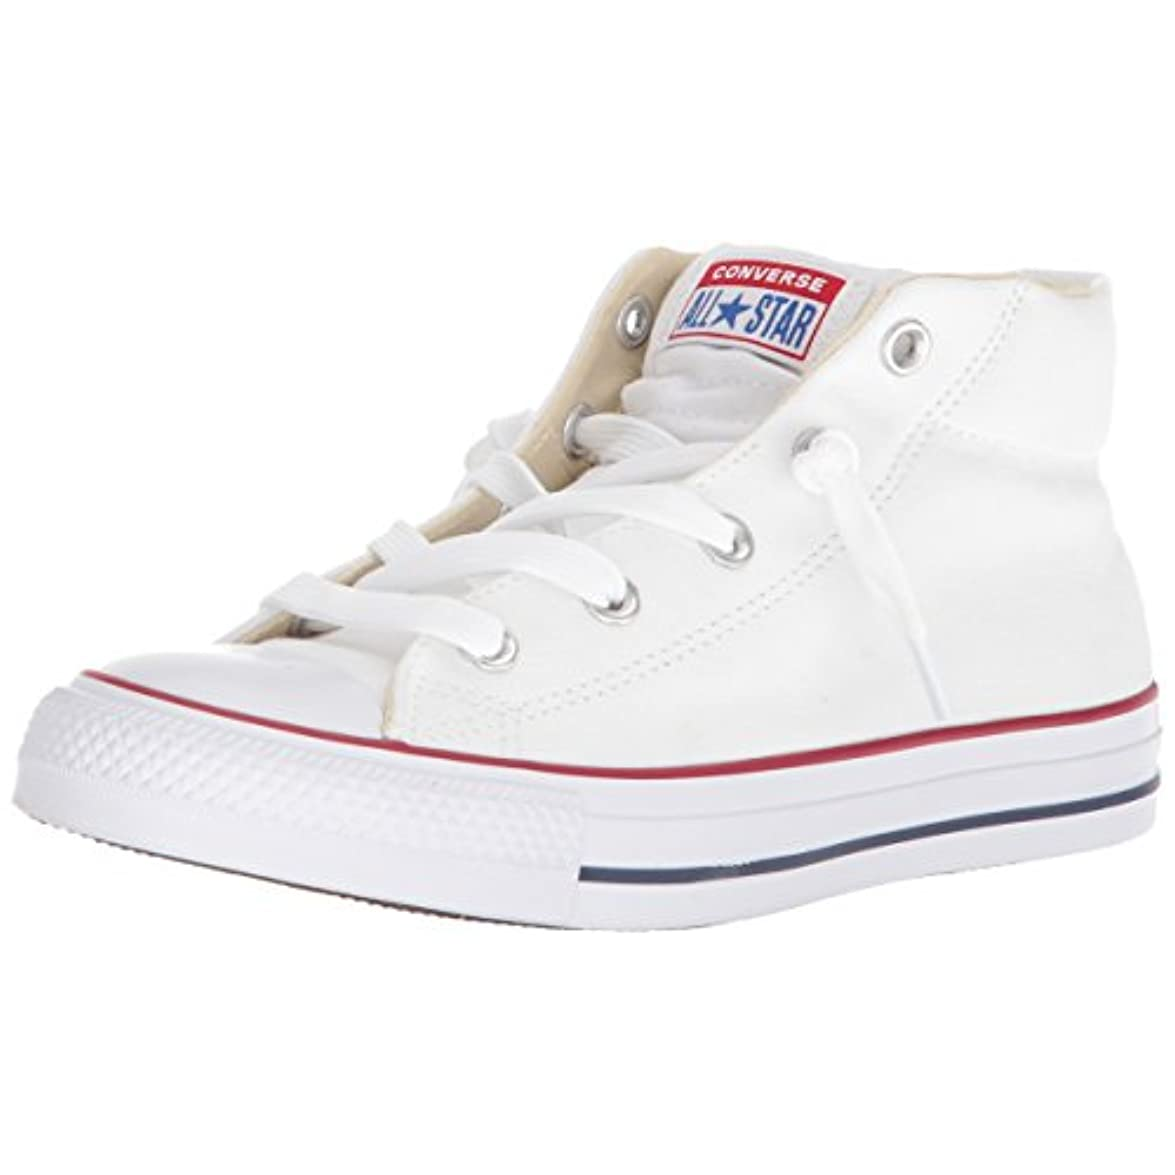 Converse Chuck Taylor All Star Via Sneaker